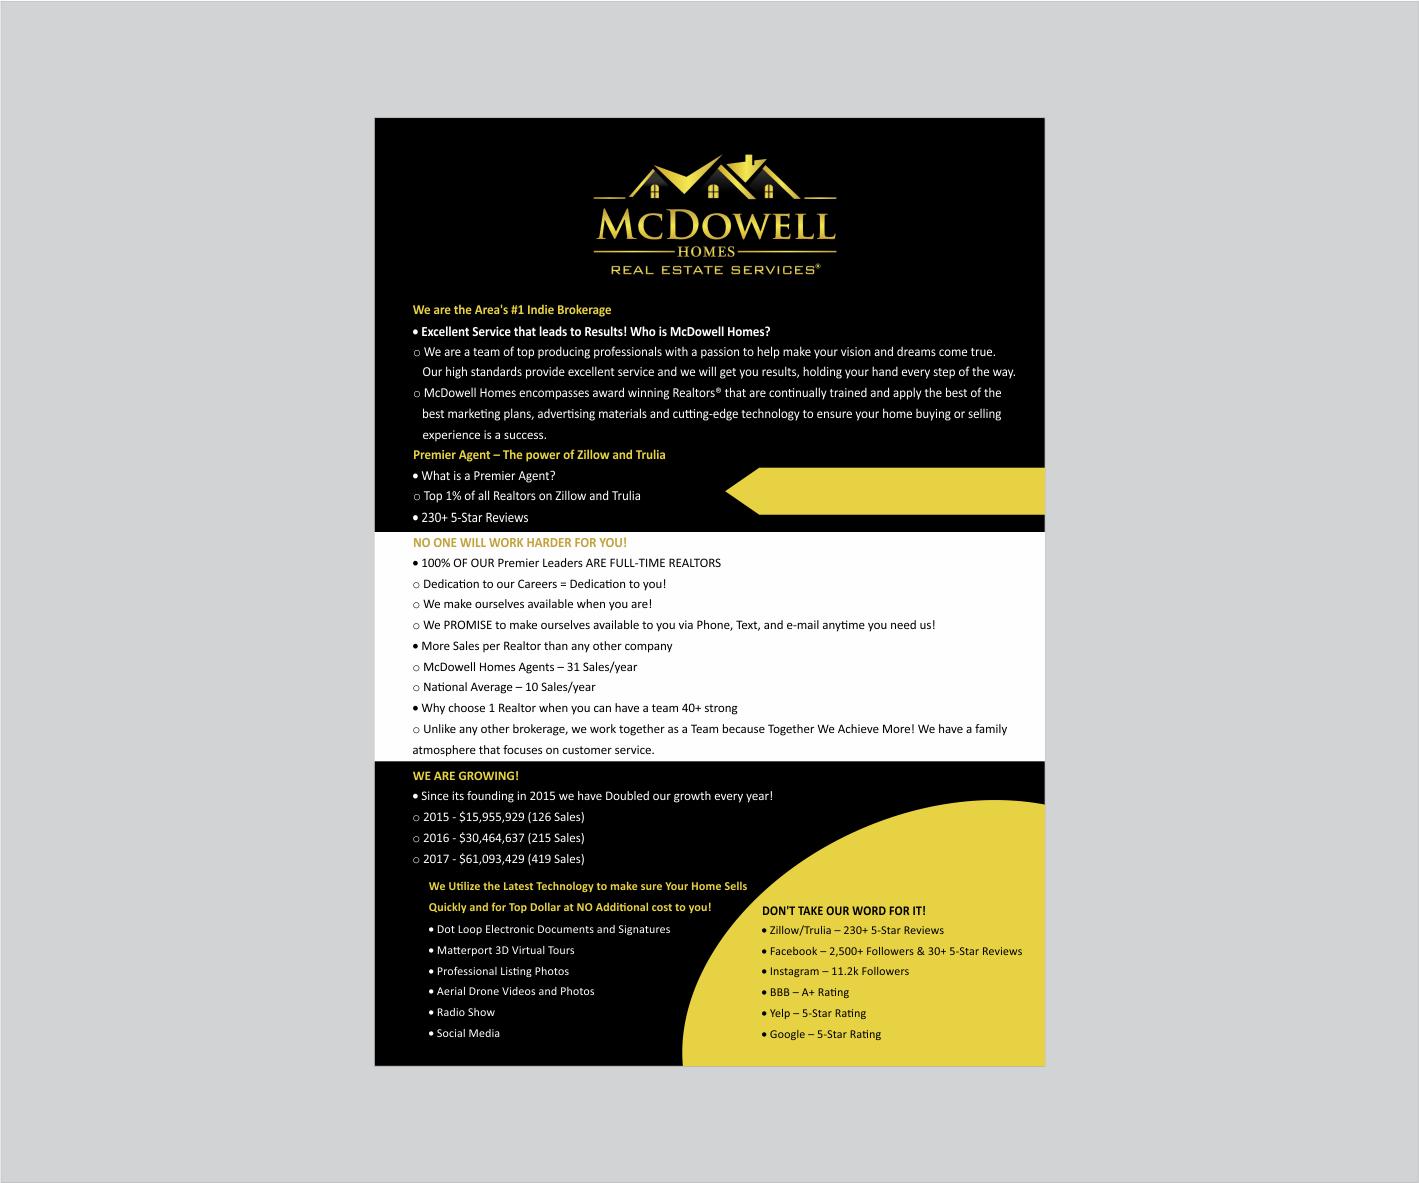 Designing A Home Sale Brochure on moving brochure, events brochure, tax preparation brochure, investment brochure, property management brochure, construction brochure, gardening brochure, starbucks brochure, iphone brochure, transportation brochure, immigration brochure, realtor brochure, condo brochure, buyers brochure, business brochure,